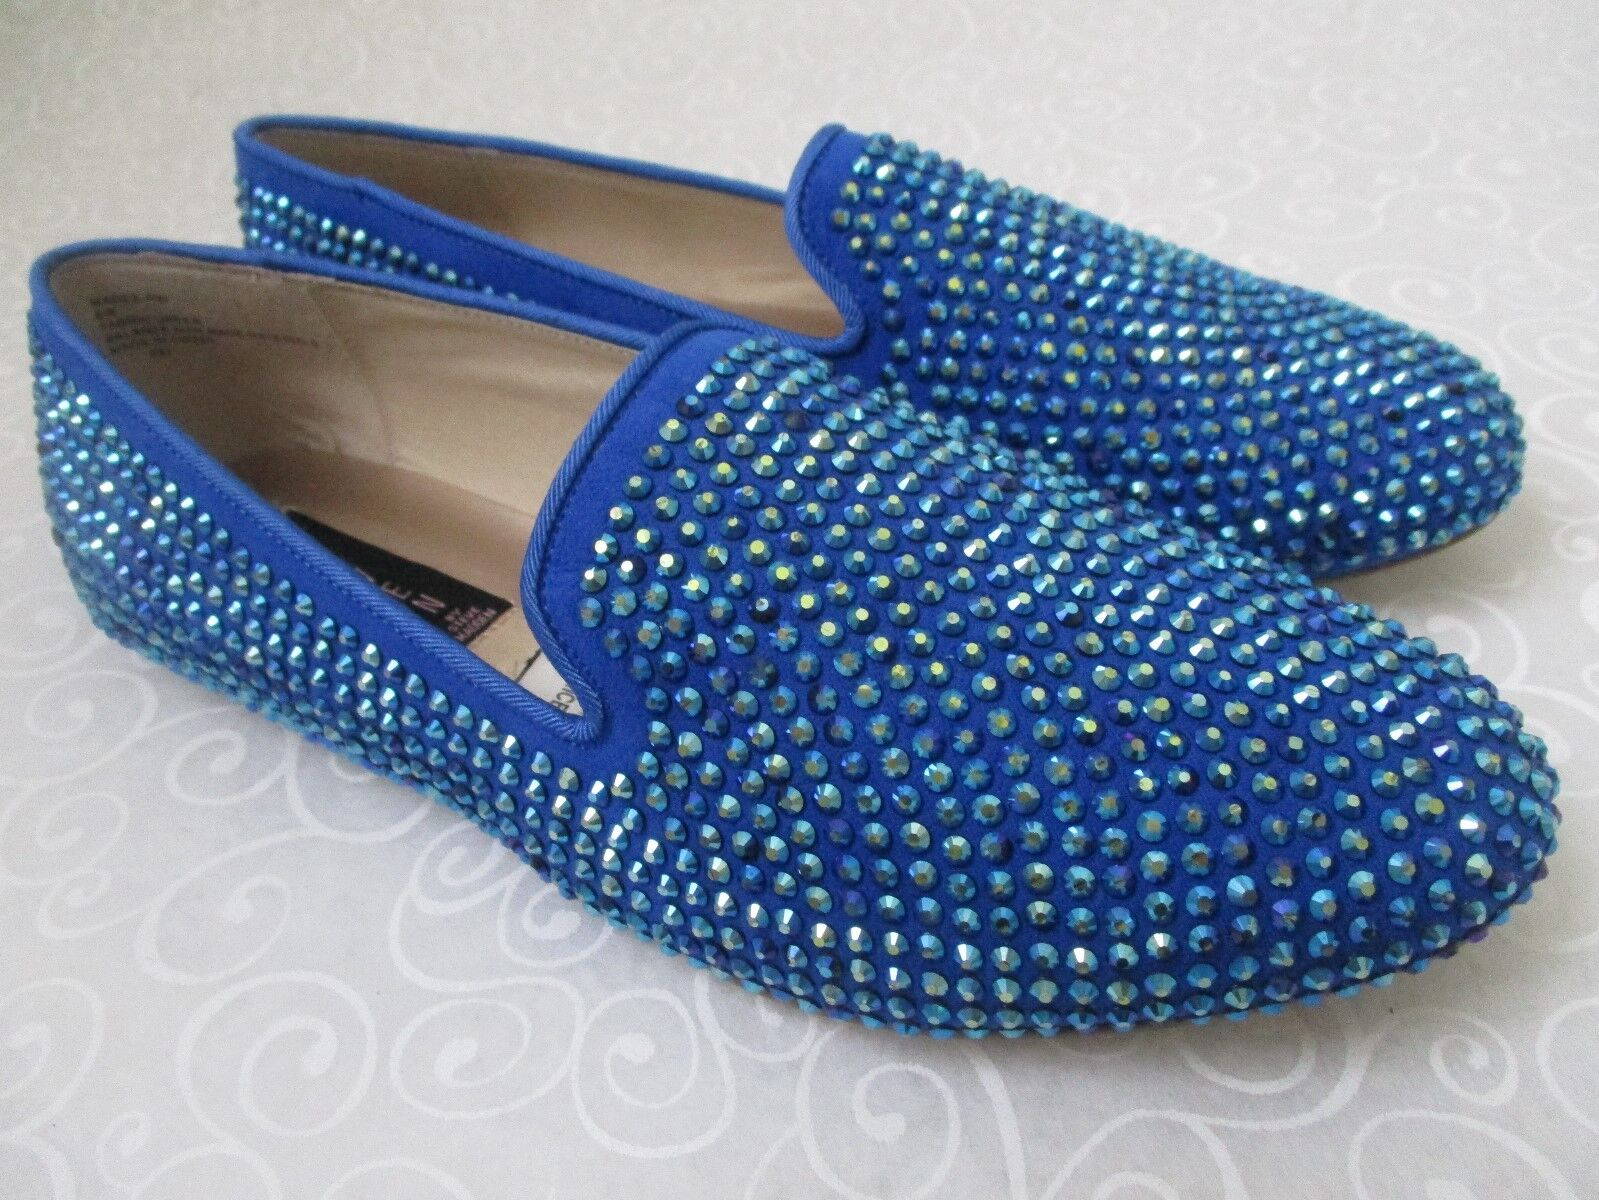 99 STEVEN BY STEVE MADDEN Blau RHINESTONE FLATS Schuhe SIZE 7 1/2 M - NEU